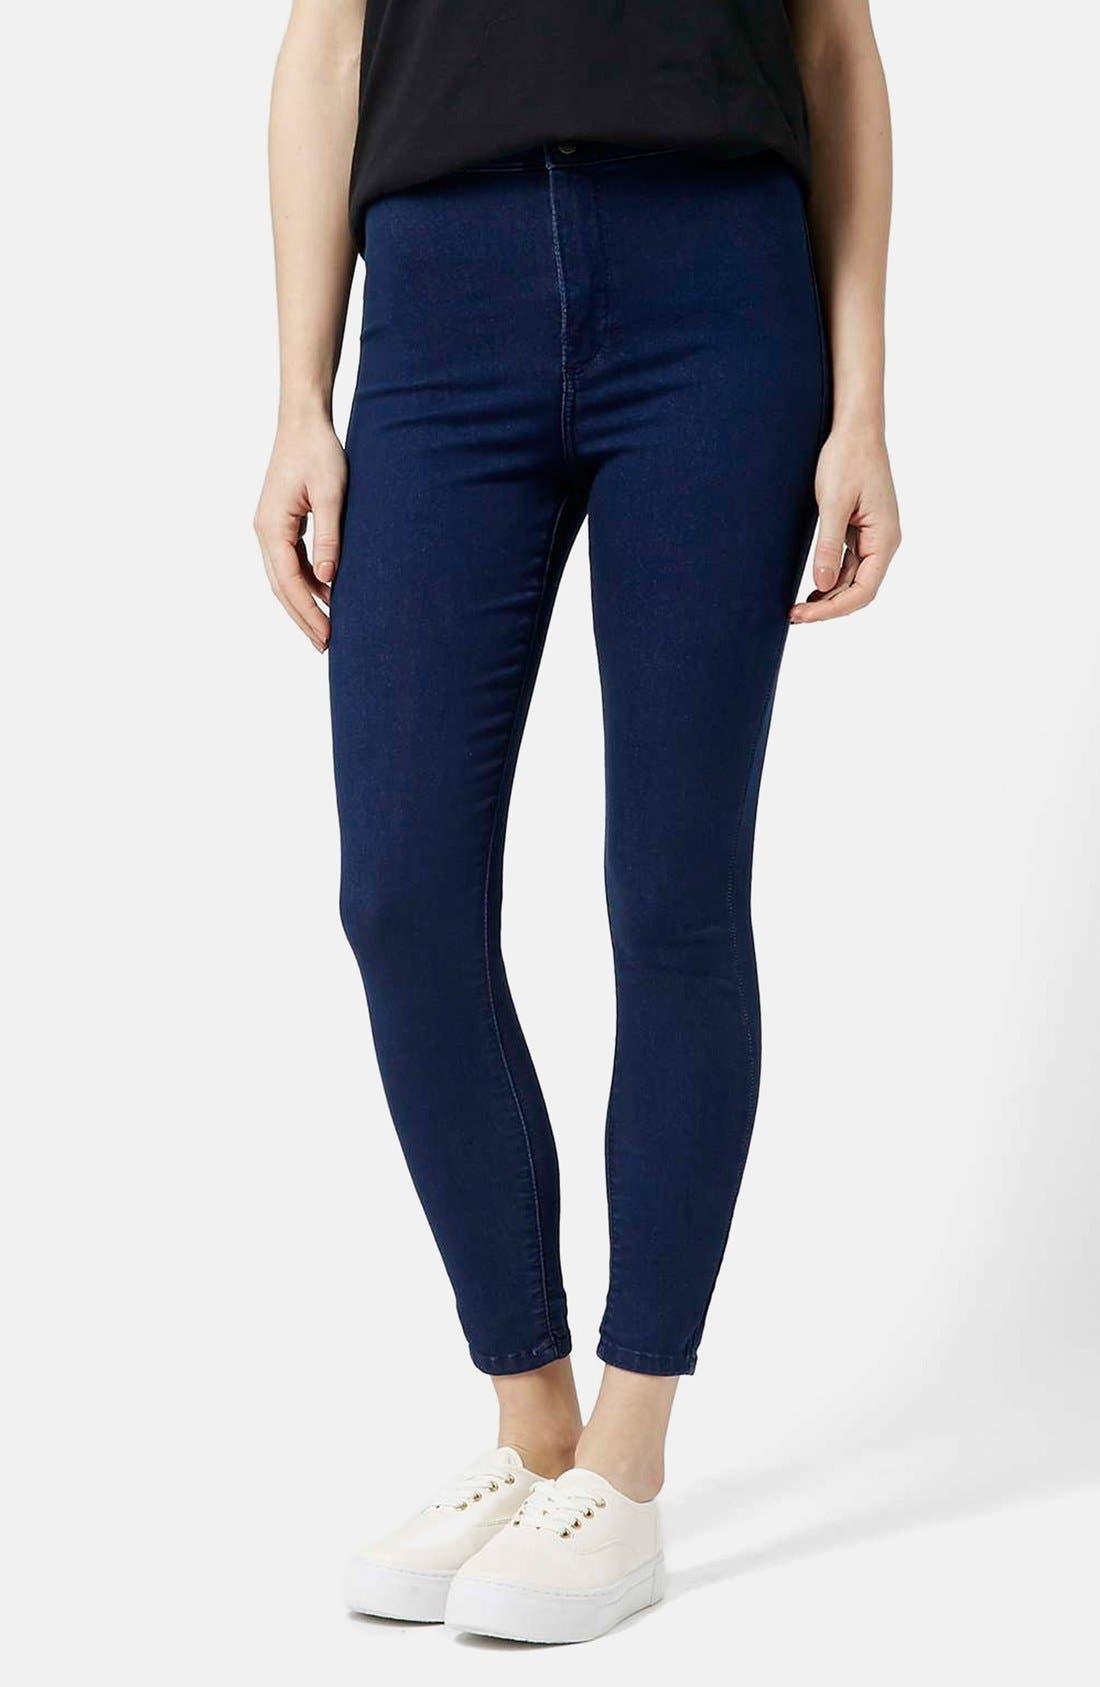 Alternate Image 1 Selected - Topshop Moto 'Joni' Ankle Skinny Jeans (Bright Blue) (Petite)